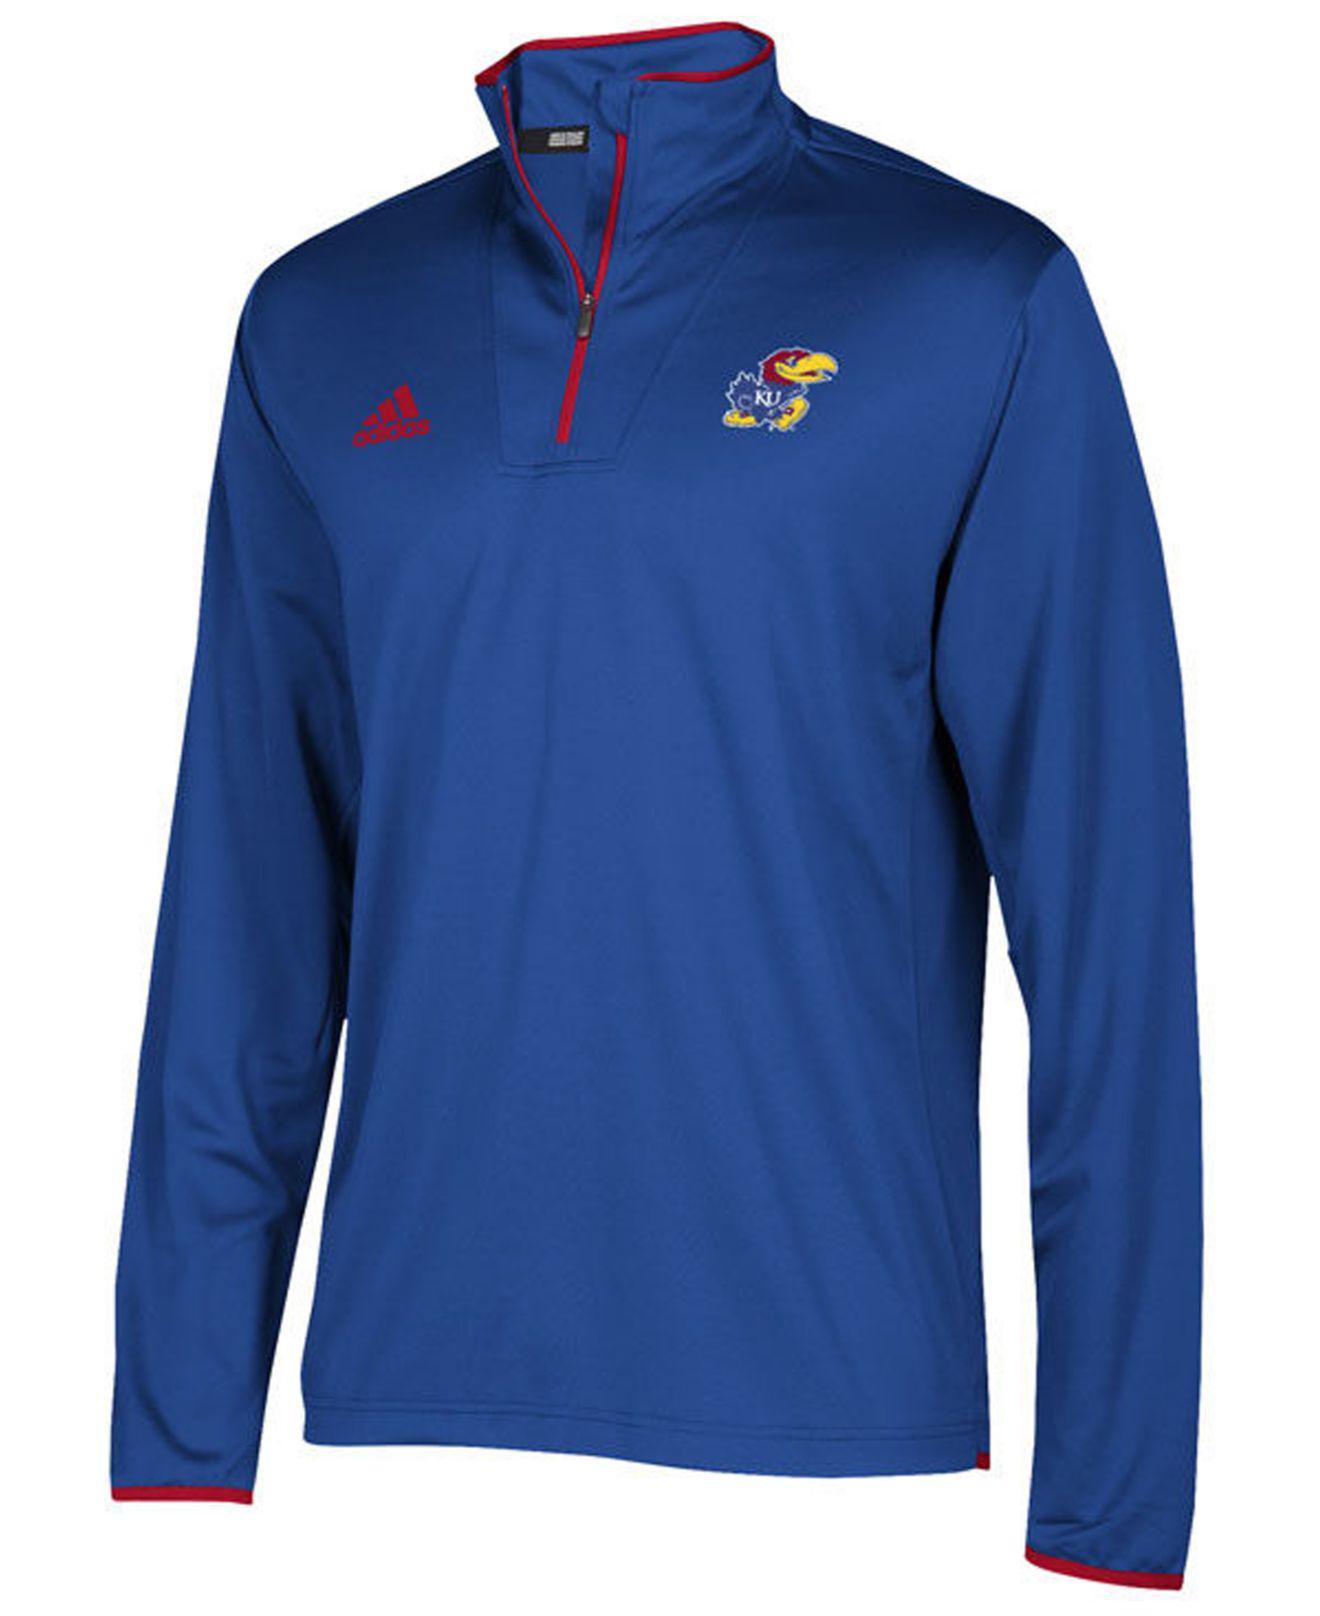 Lyst adidas Kansas Jayhawks Team Iconic Quarter zip